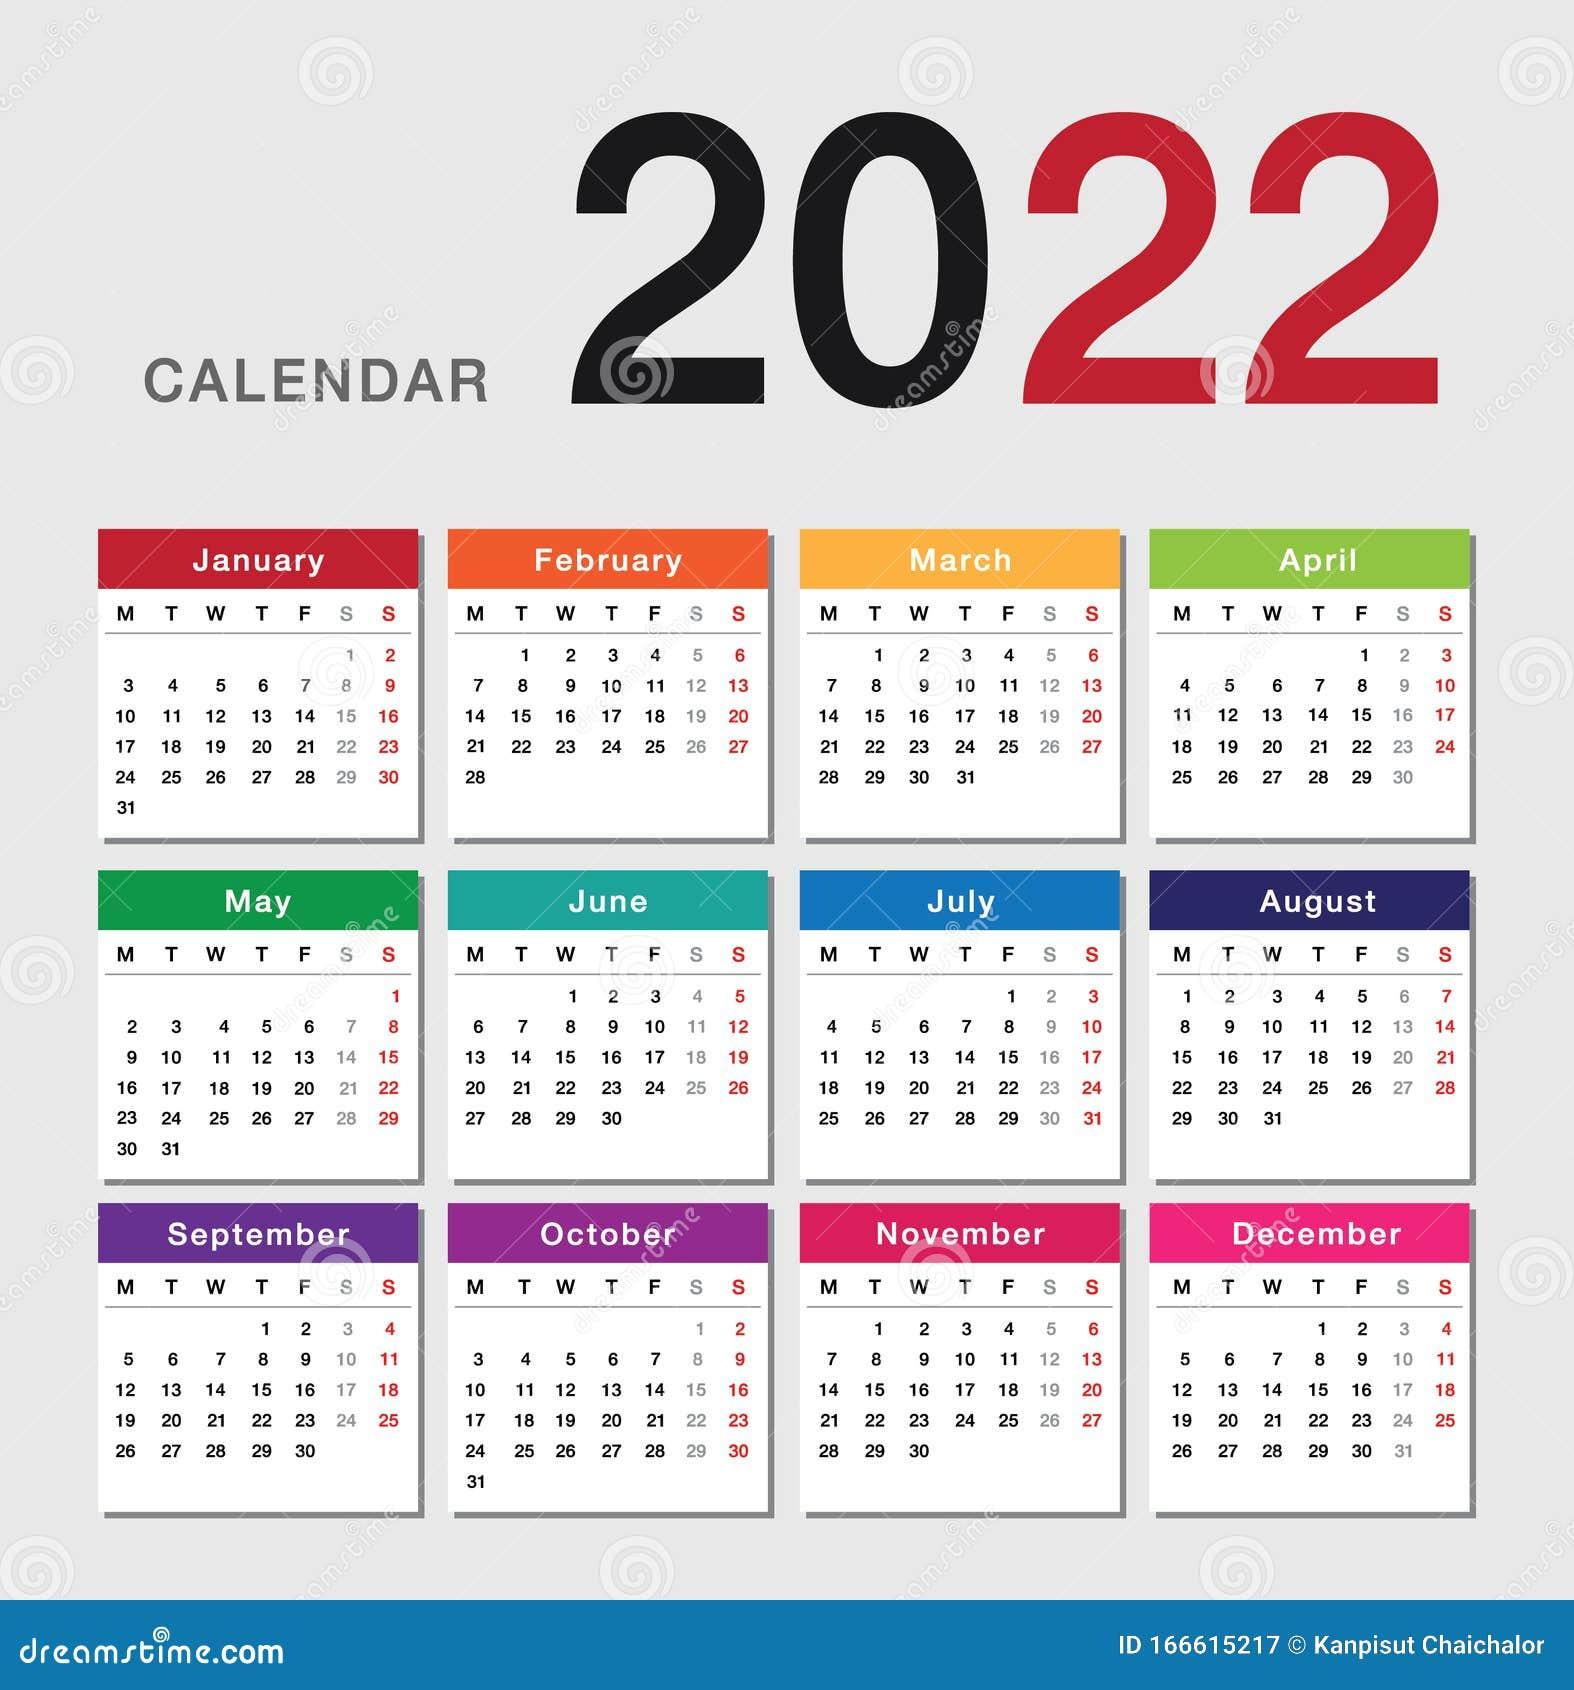 2022 2023 Calendar.Colorful Year 2022 Calendar Horizontal Vector Design Template Simple And Clean Design Stock Illustration Illustration Of Date April 166615217